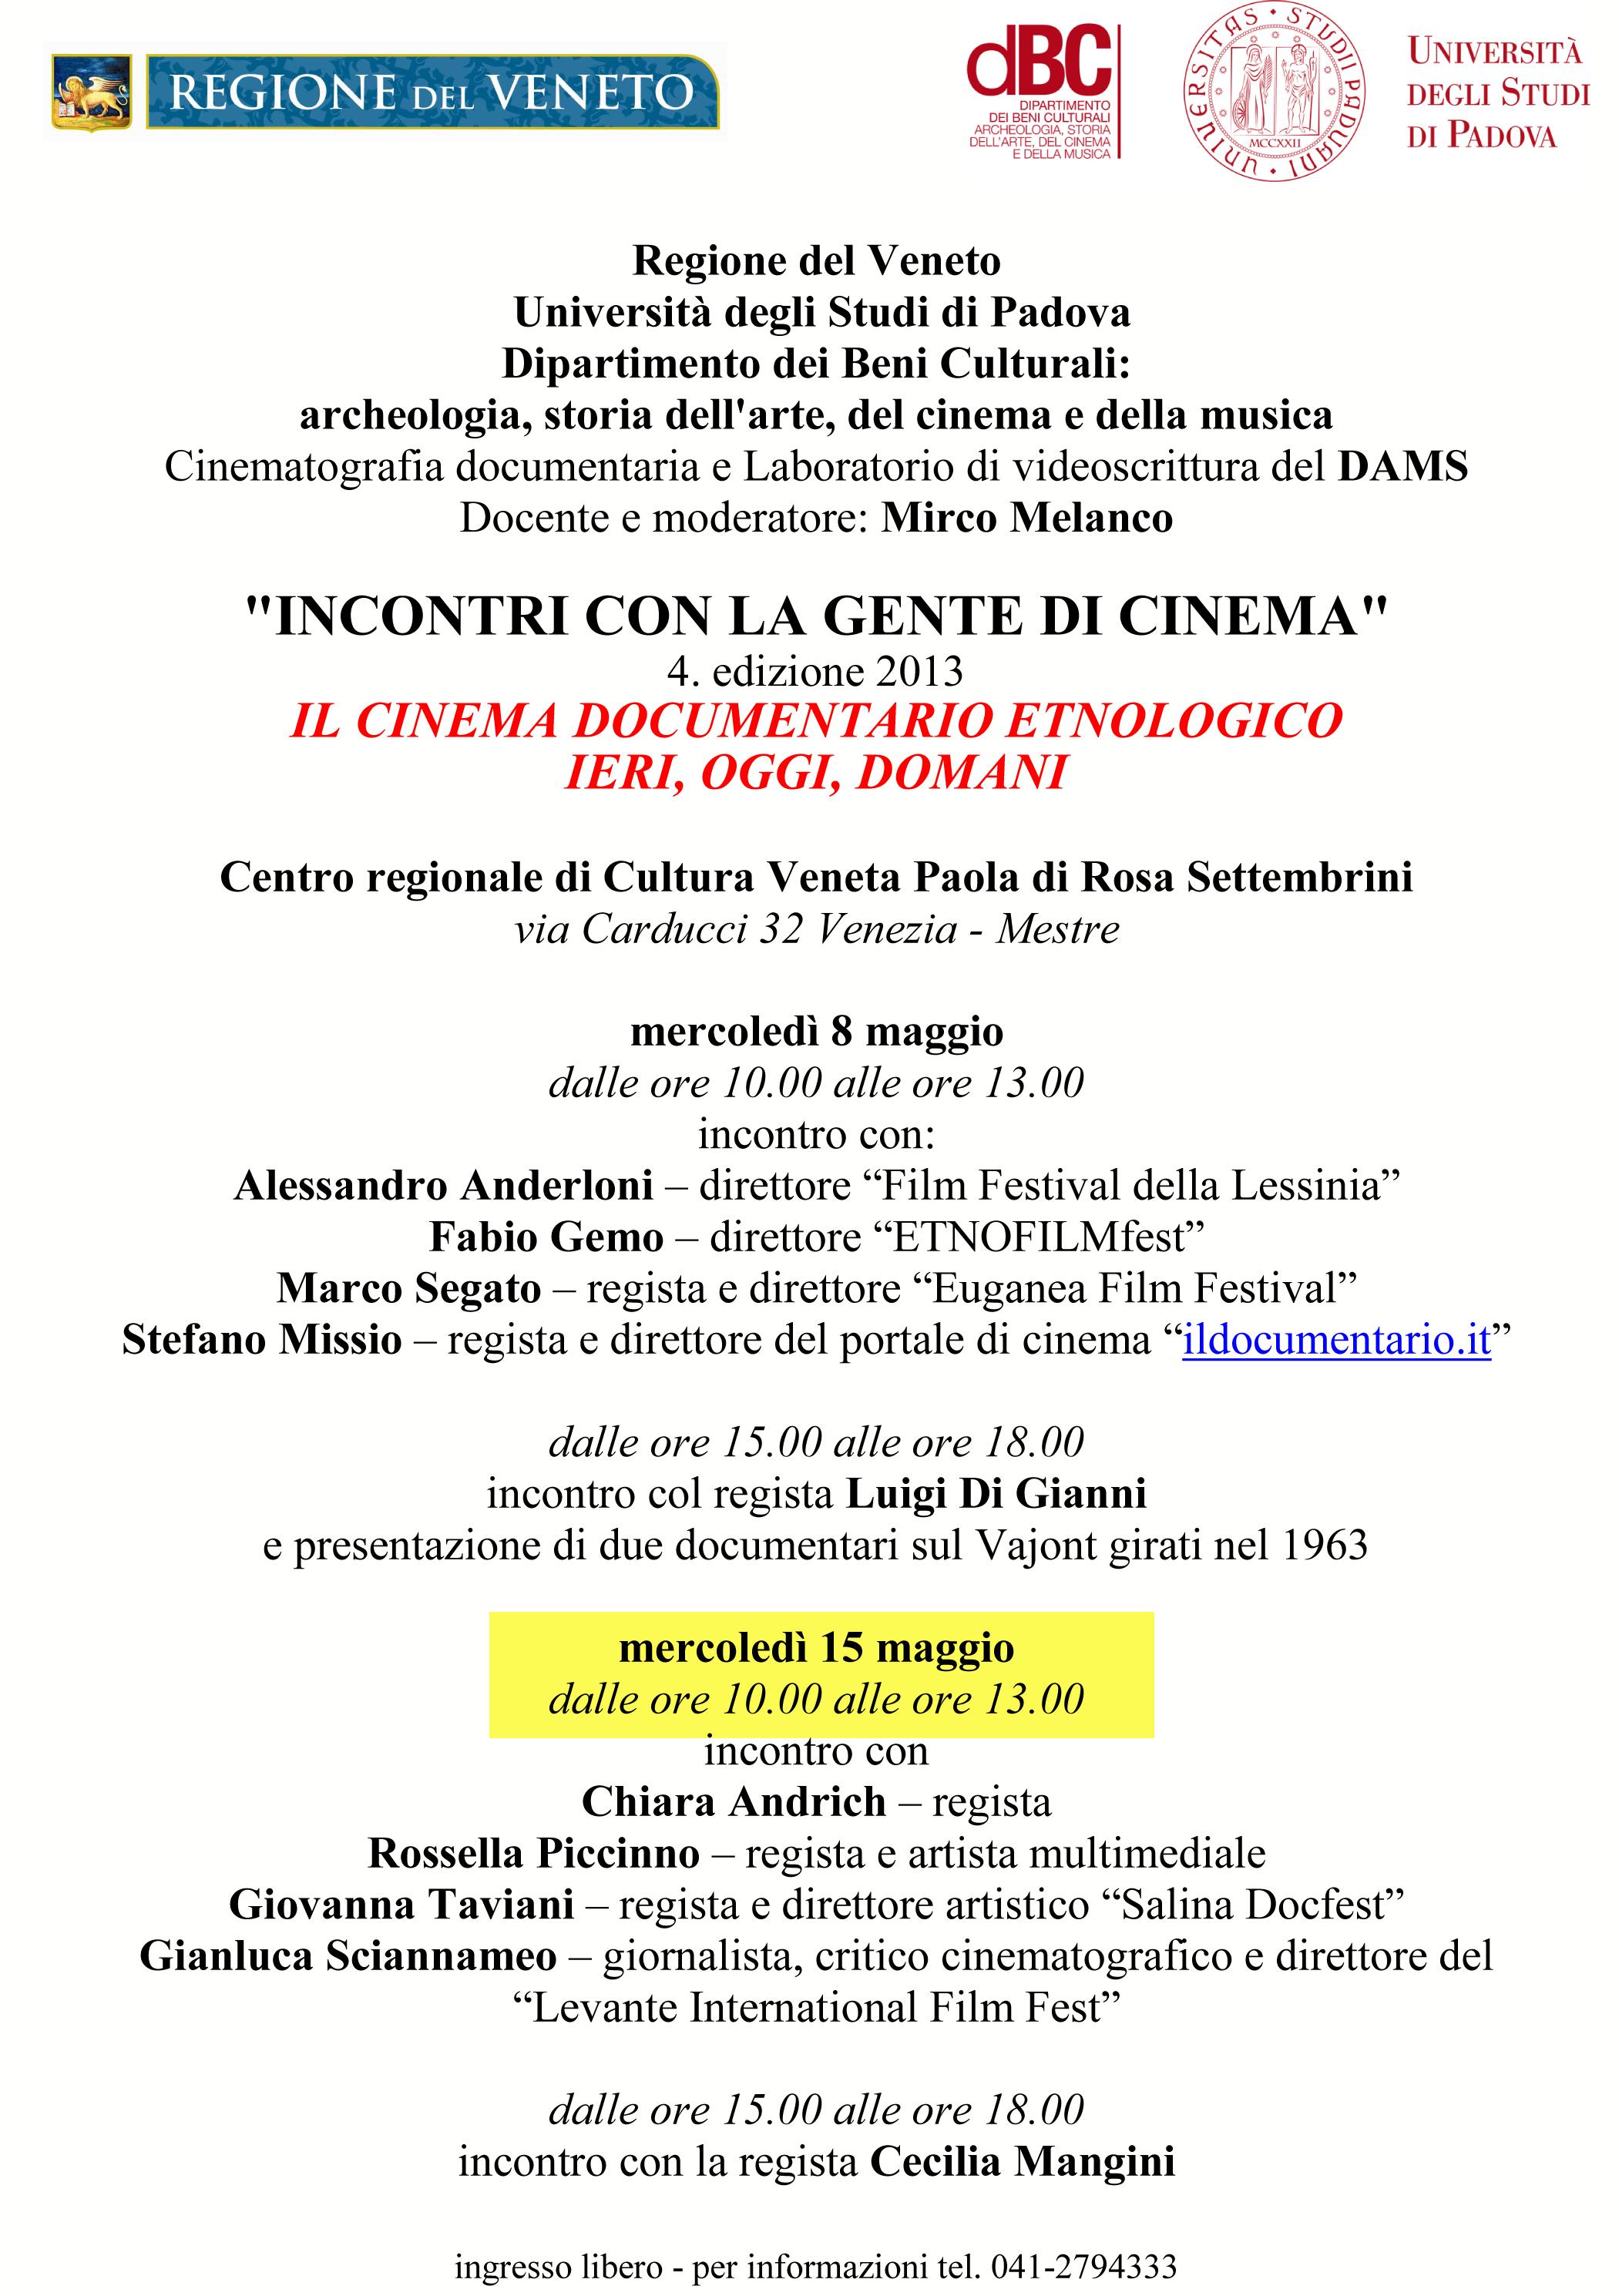 Microsoft Word - Locandina finalissima INCONTRI 2013.doc